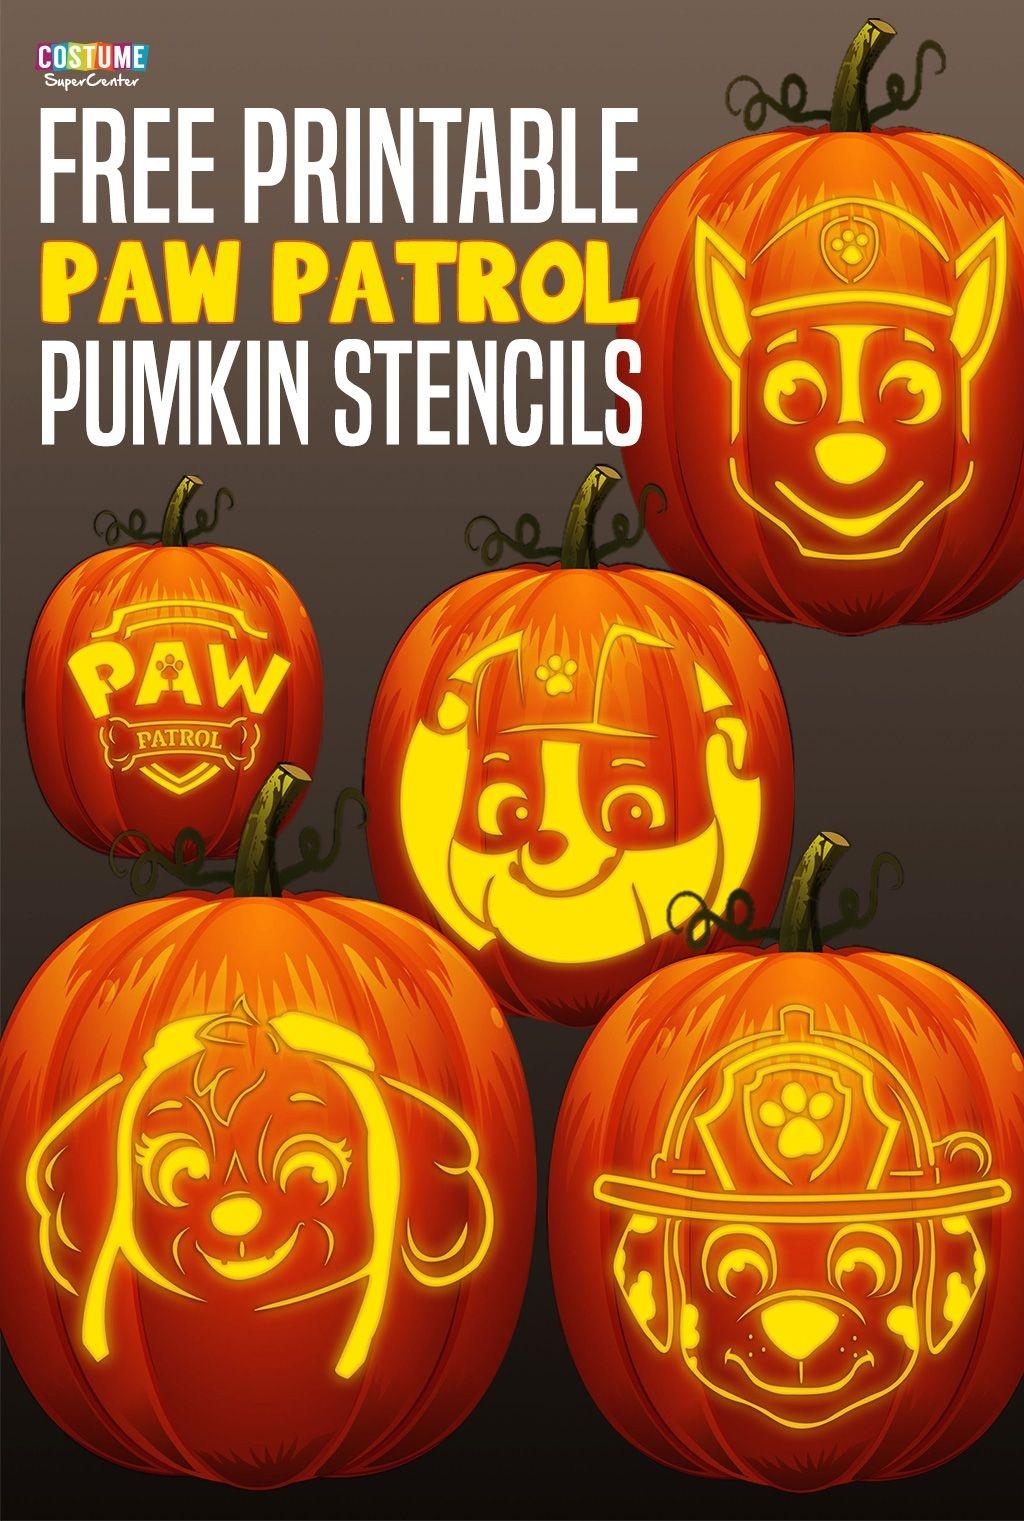 Free Paw Patrol Pumpkin Stencils   Paw Patrol Birthday   Paw Patrol - Halloween Pumpkin Carving Stencils Free Printable